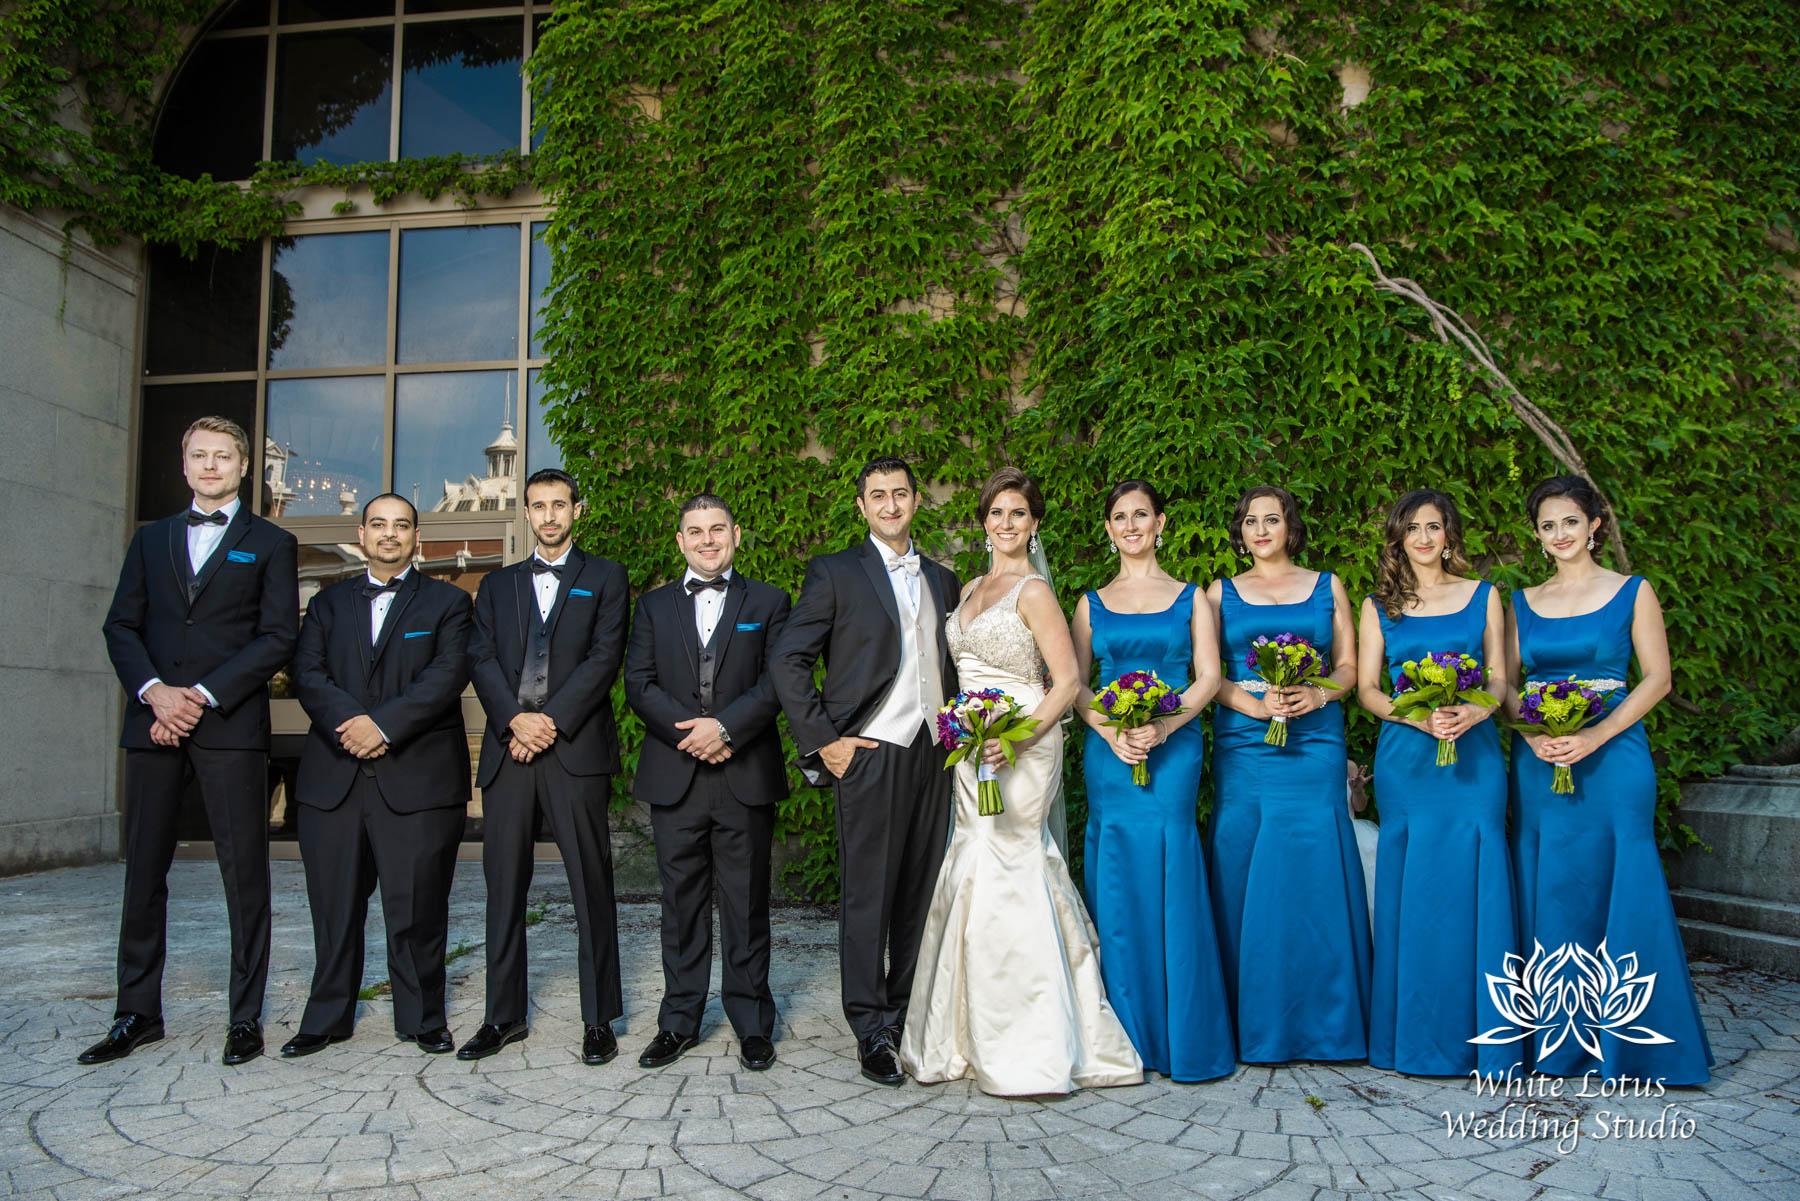 133 - Wedding - Toronto - Liberty Grand - Bridal Party - PW